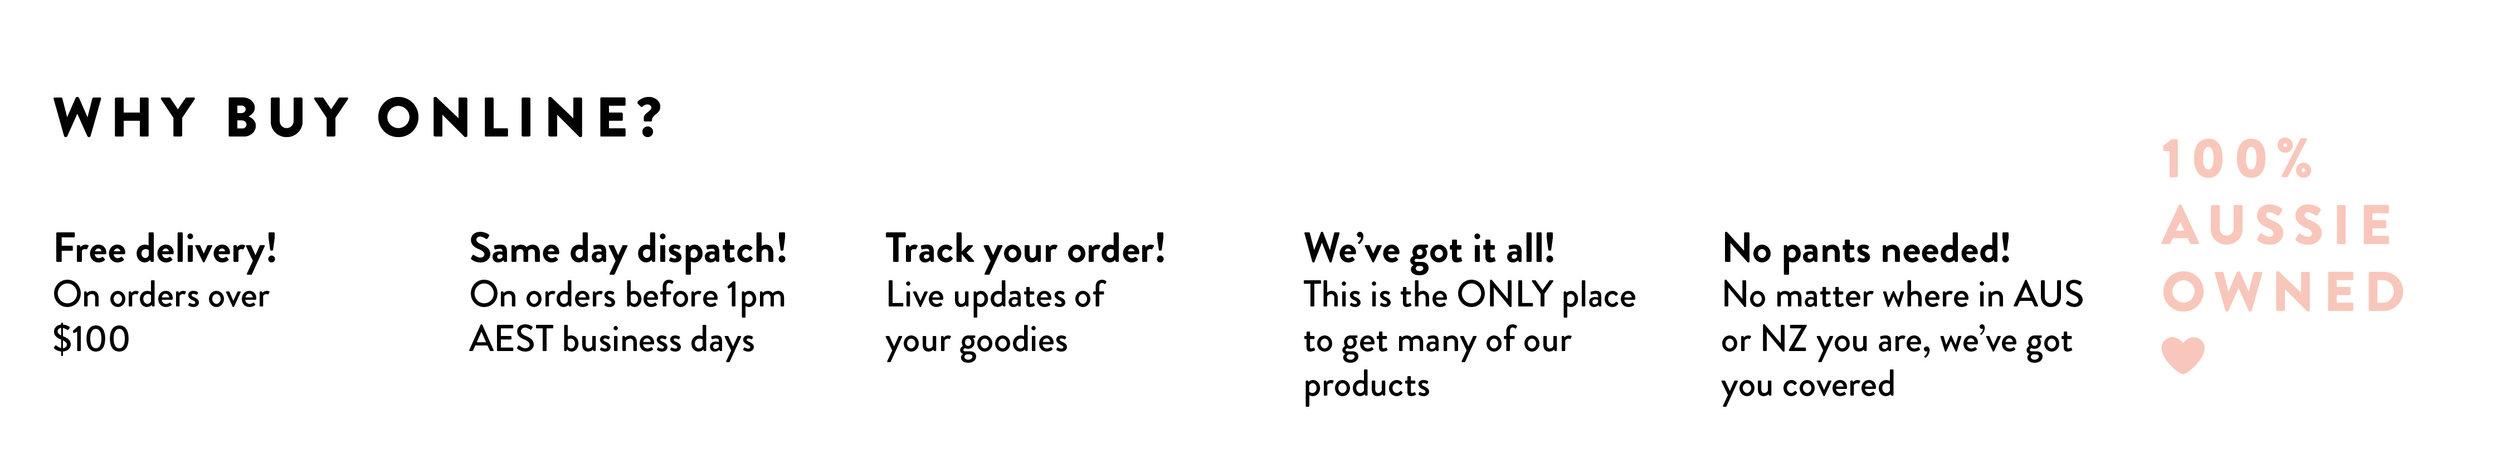 why buy online themromix-01.jpg